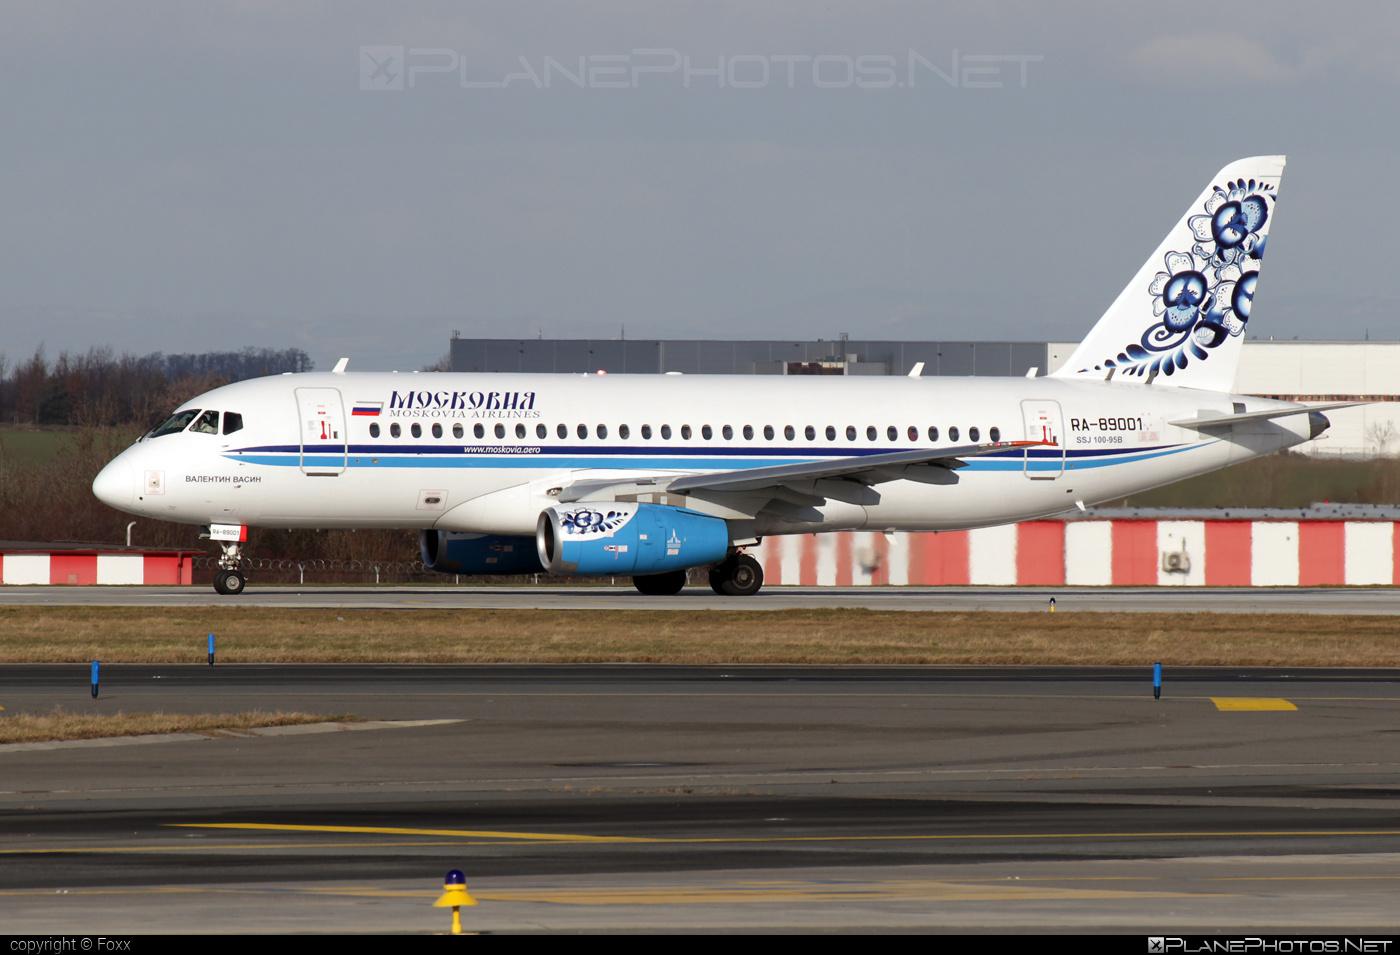 Sukhoi SSJ 100-95B Superjet - RA-89001 operated by Moskovia Airlines #ssj100 #ssj10095b #sukhoi #sukhoisuperjet #superjet